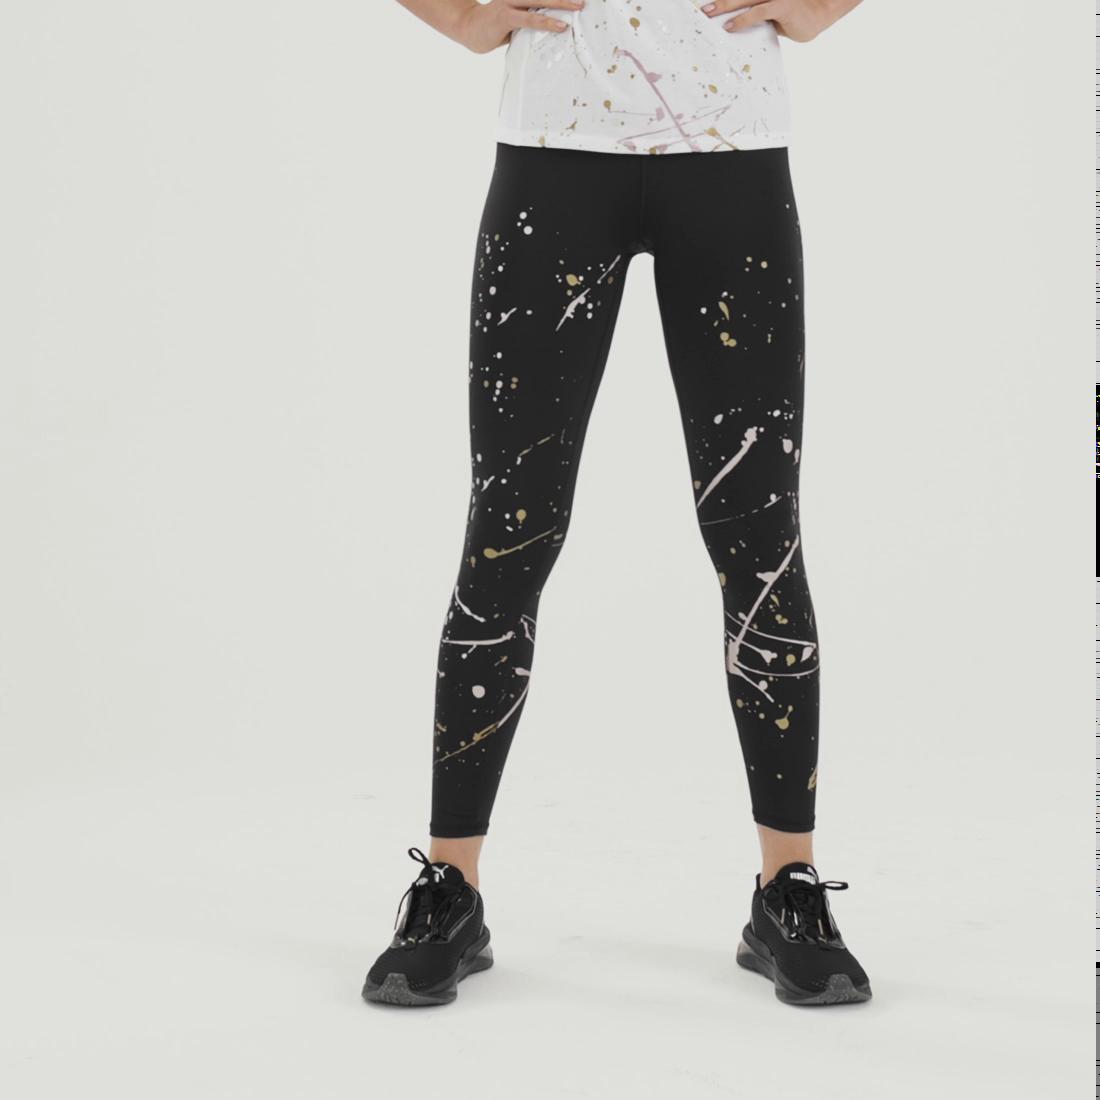 Imagen PUMA Calzas de training Metal Splash Splatter para mujer #6